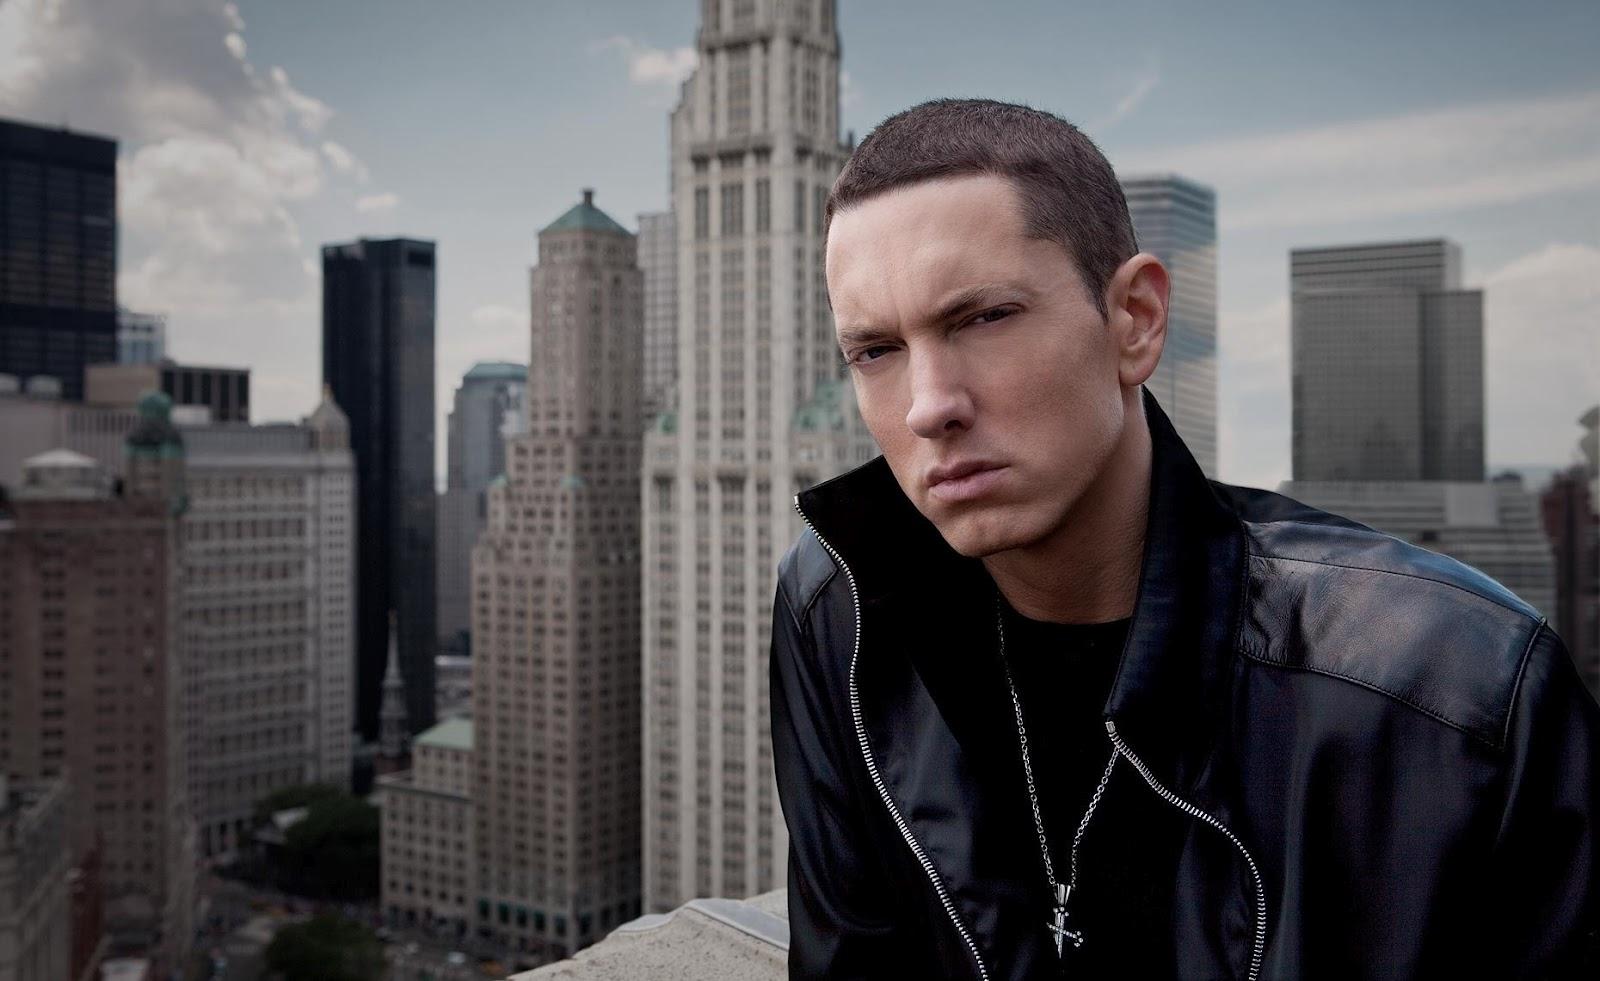 http://2.bp.blogspot.com/-kJnfJiSlqvQ/T9oa_BMVSiI/AAAAAAAAKlg/y4kjGvMQVlk/s1600/Eminem-001.jpg